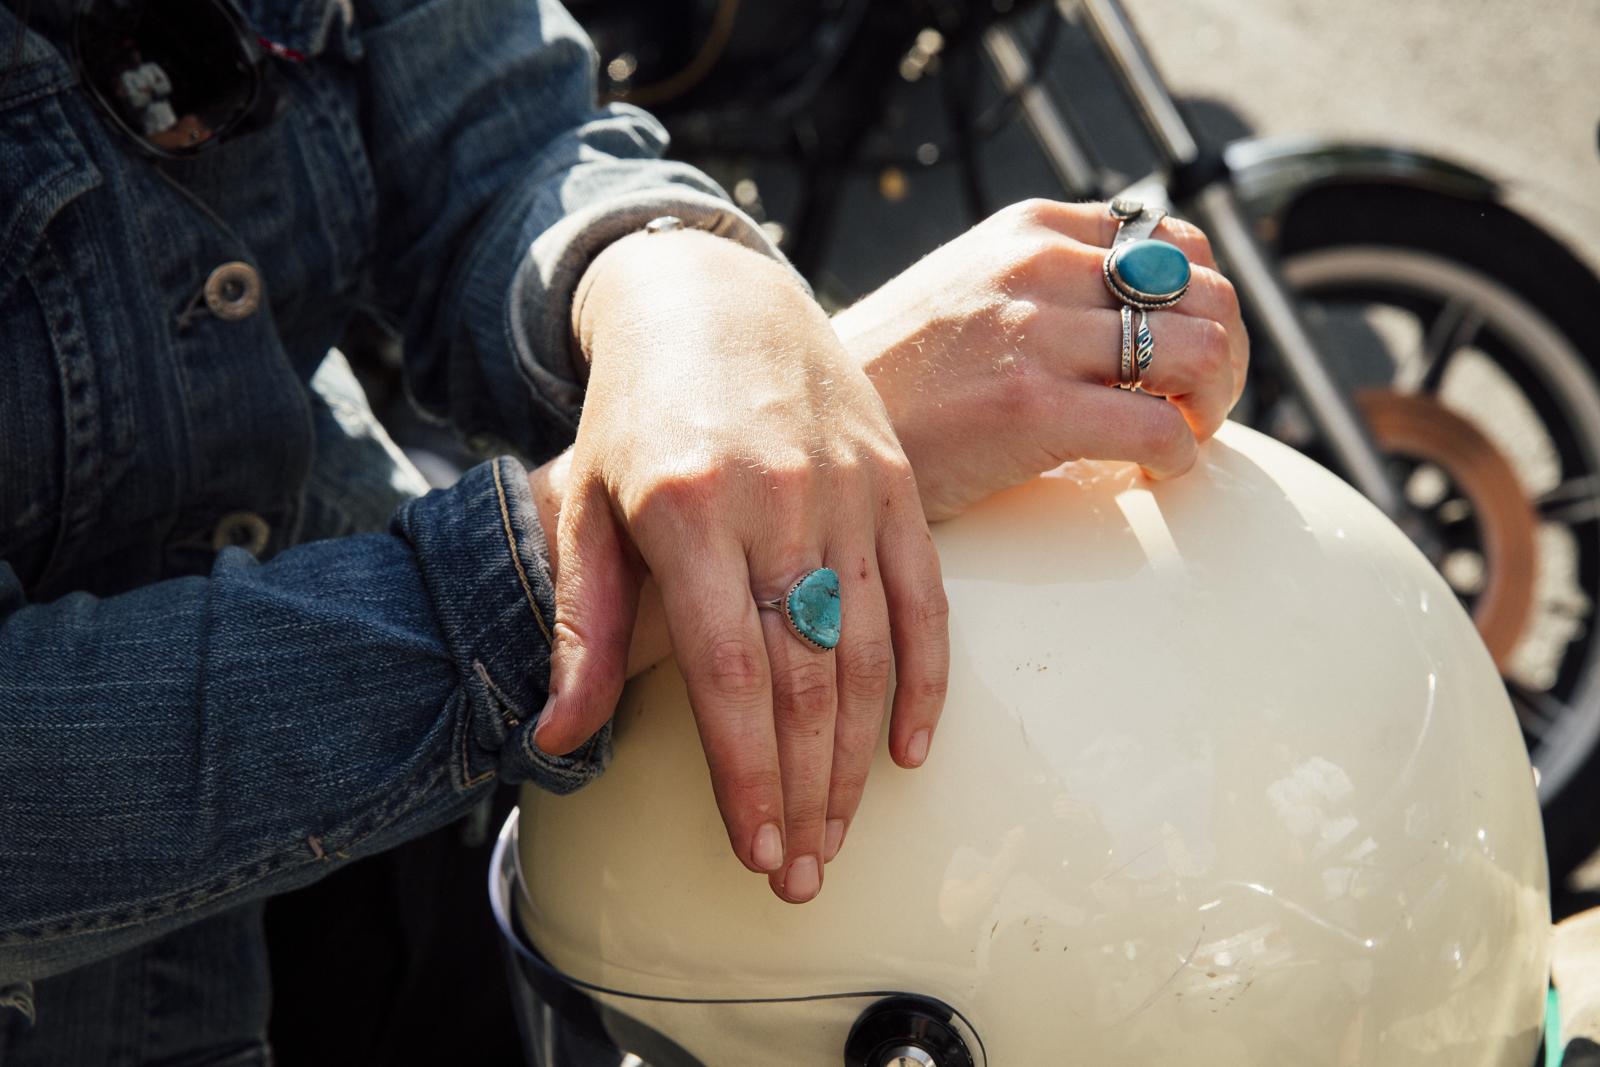 motogirls_21.jpg